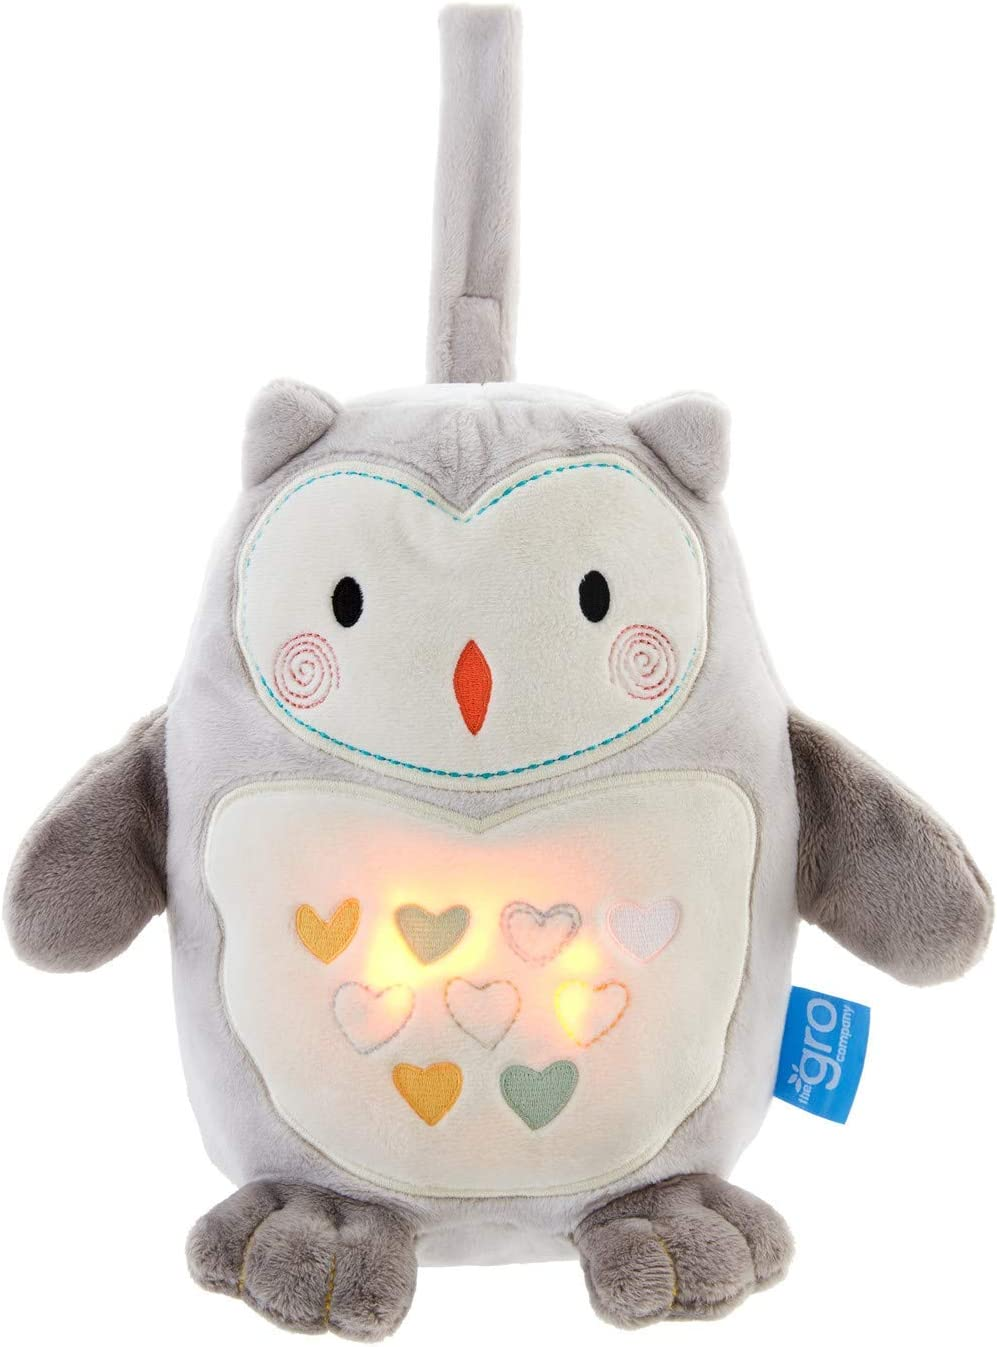 Tommee Tippee, Grofriends, Ollie el Búho - Peluche Duermebebés con Sensor de Llanto